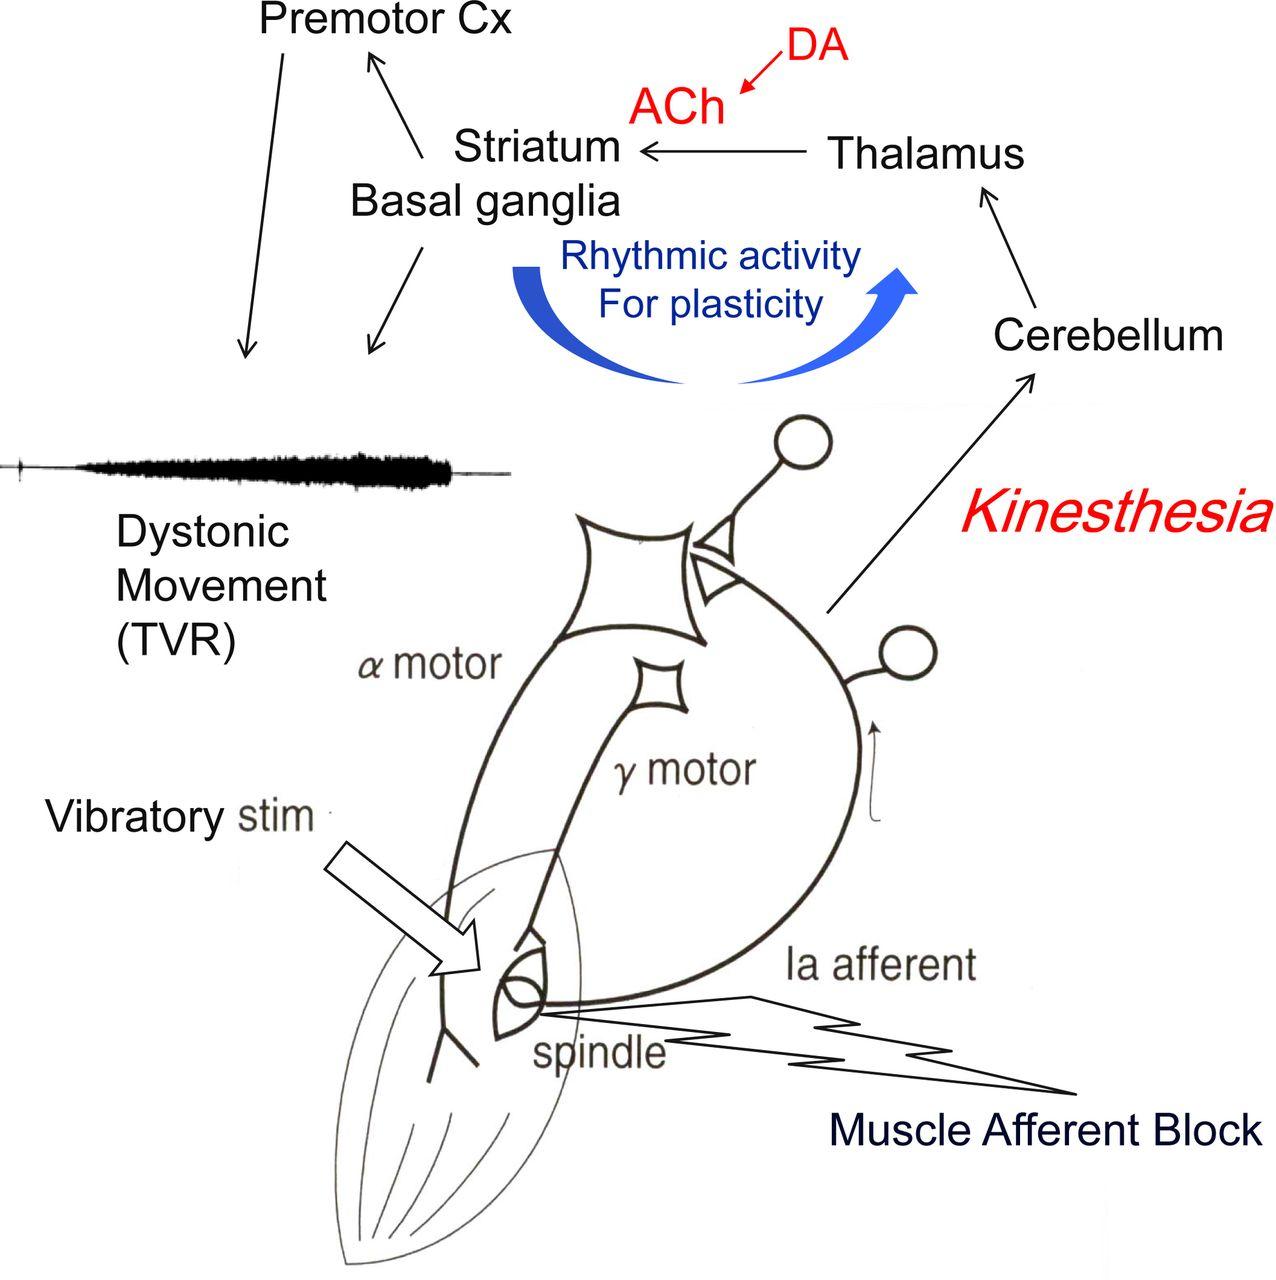 pathogenesis of dystonia  is it of cerebellar or basal